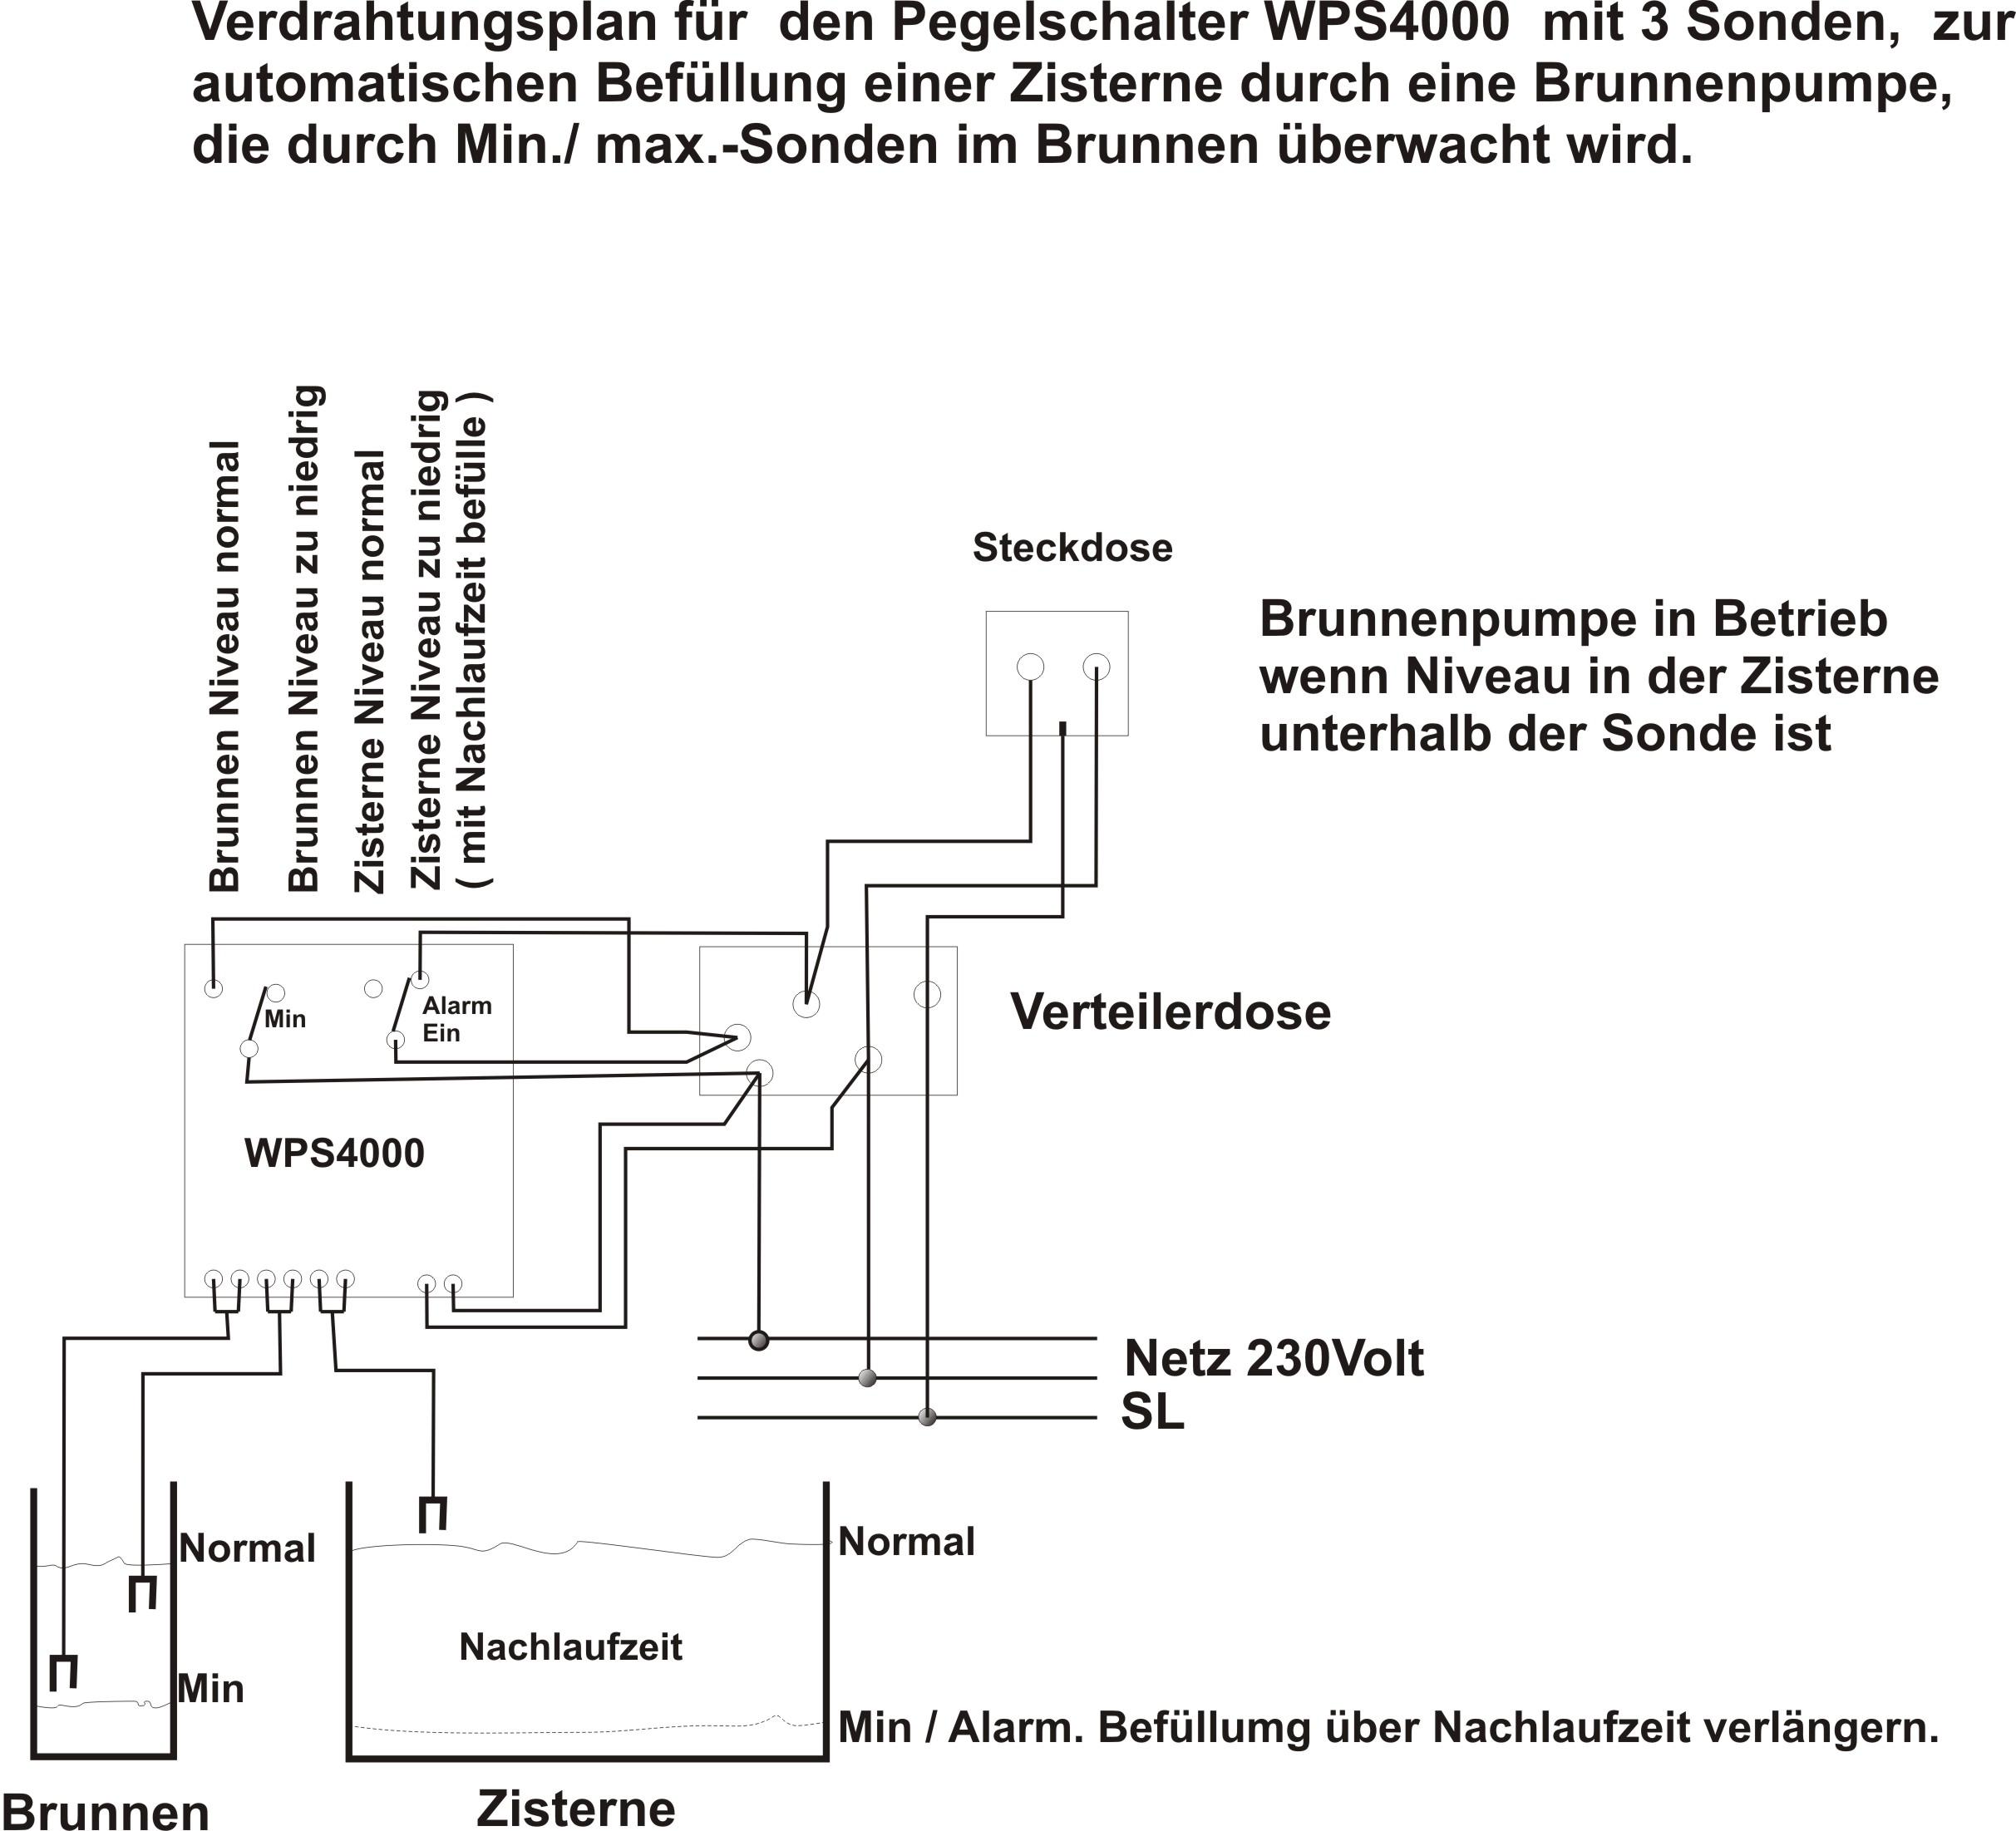 Wunderbar Tiefbrunnenpumpe Schaltplan Ideen - Elektrische Schaltplan ...